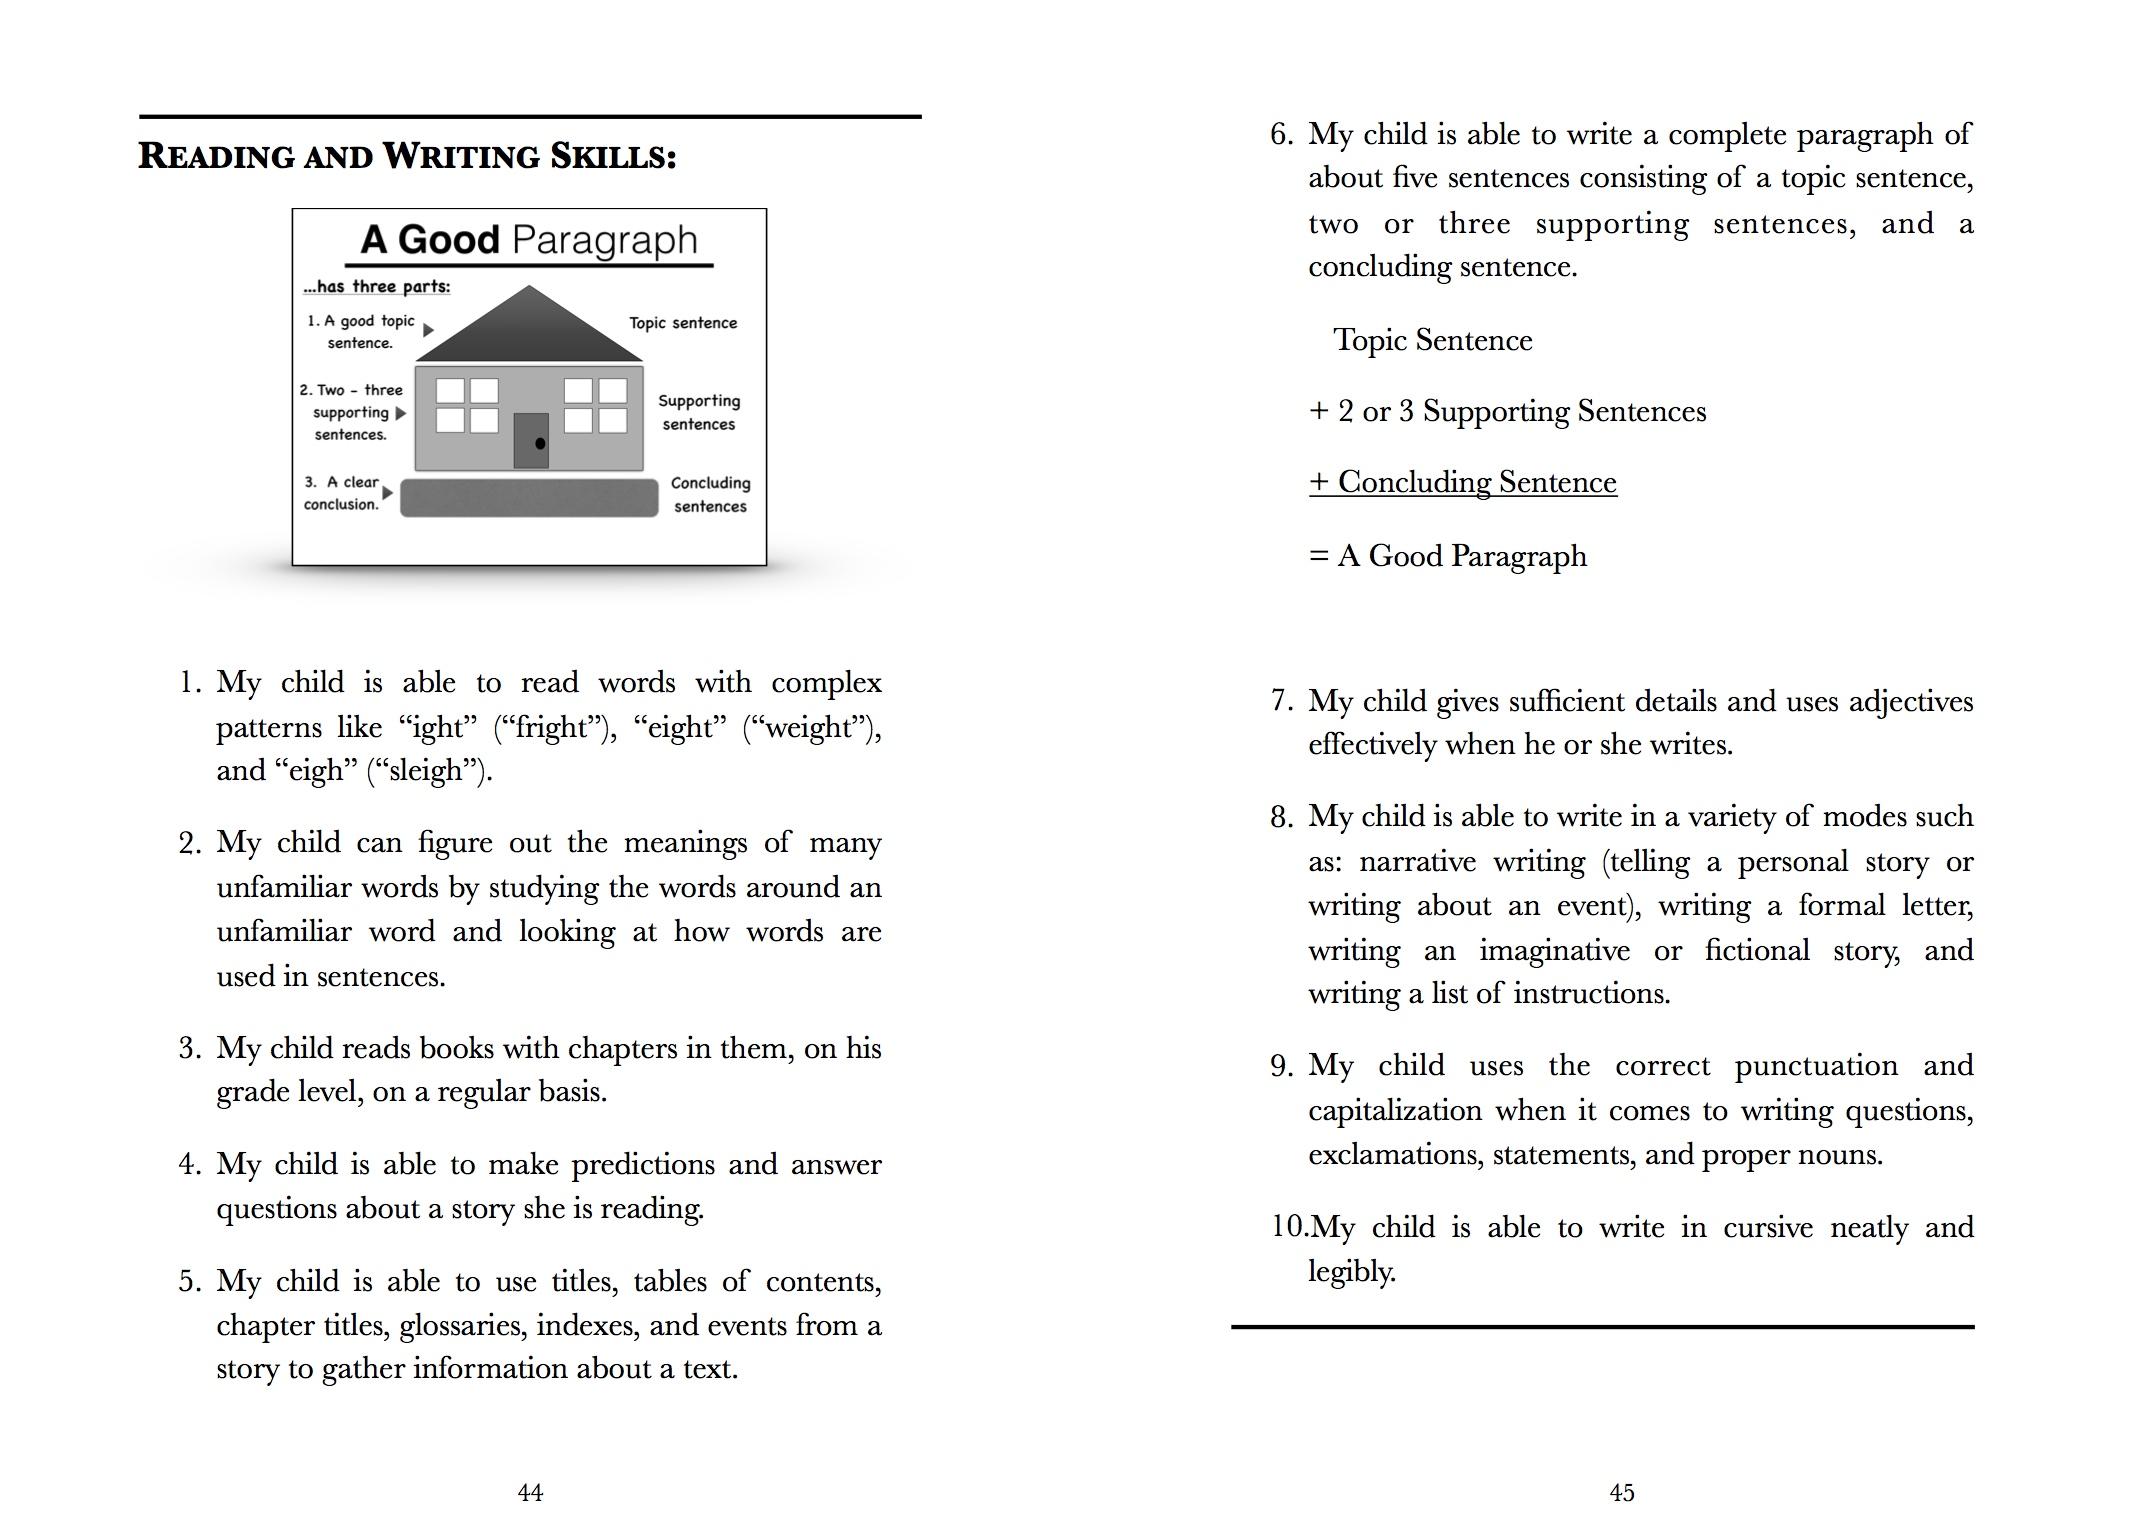 Third Grade Reading and Writing Skills Example.jpg